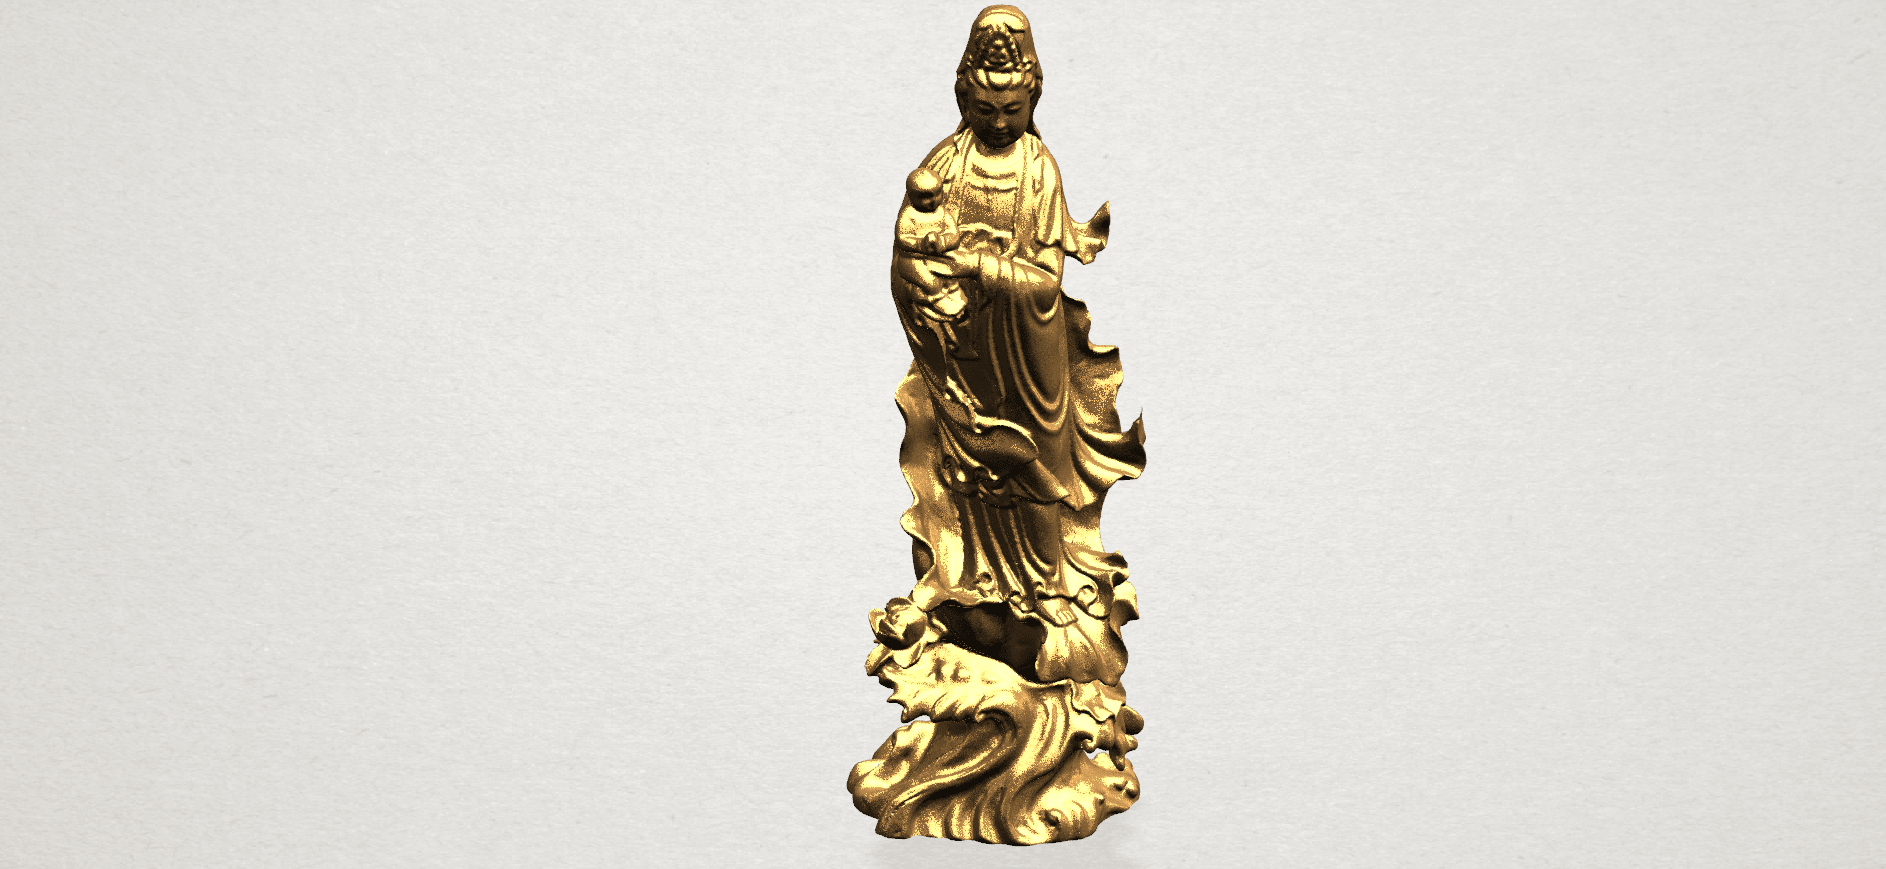 Avalokitesvara Buddha  award kid (i) A09.png Download free STL file Avalokitesvara Bodhisattva - award kid 01 • 3D print object, GeorgesNikkei